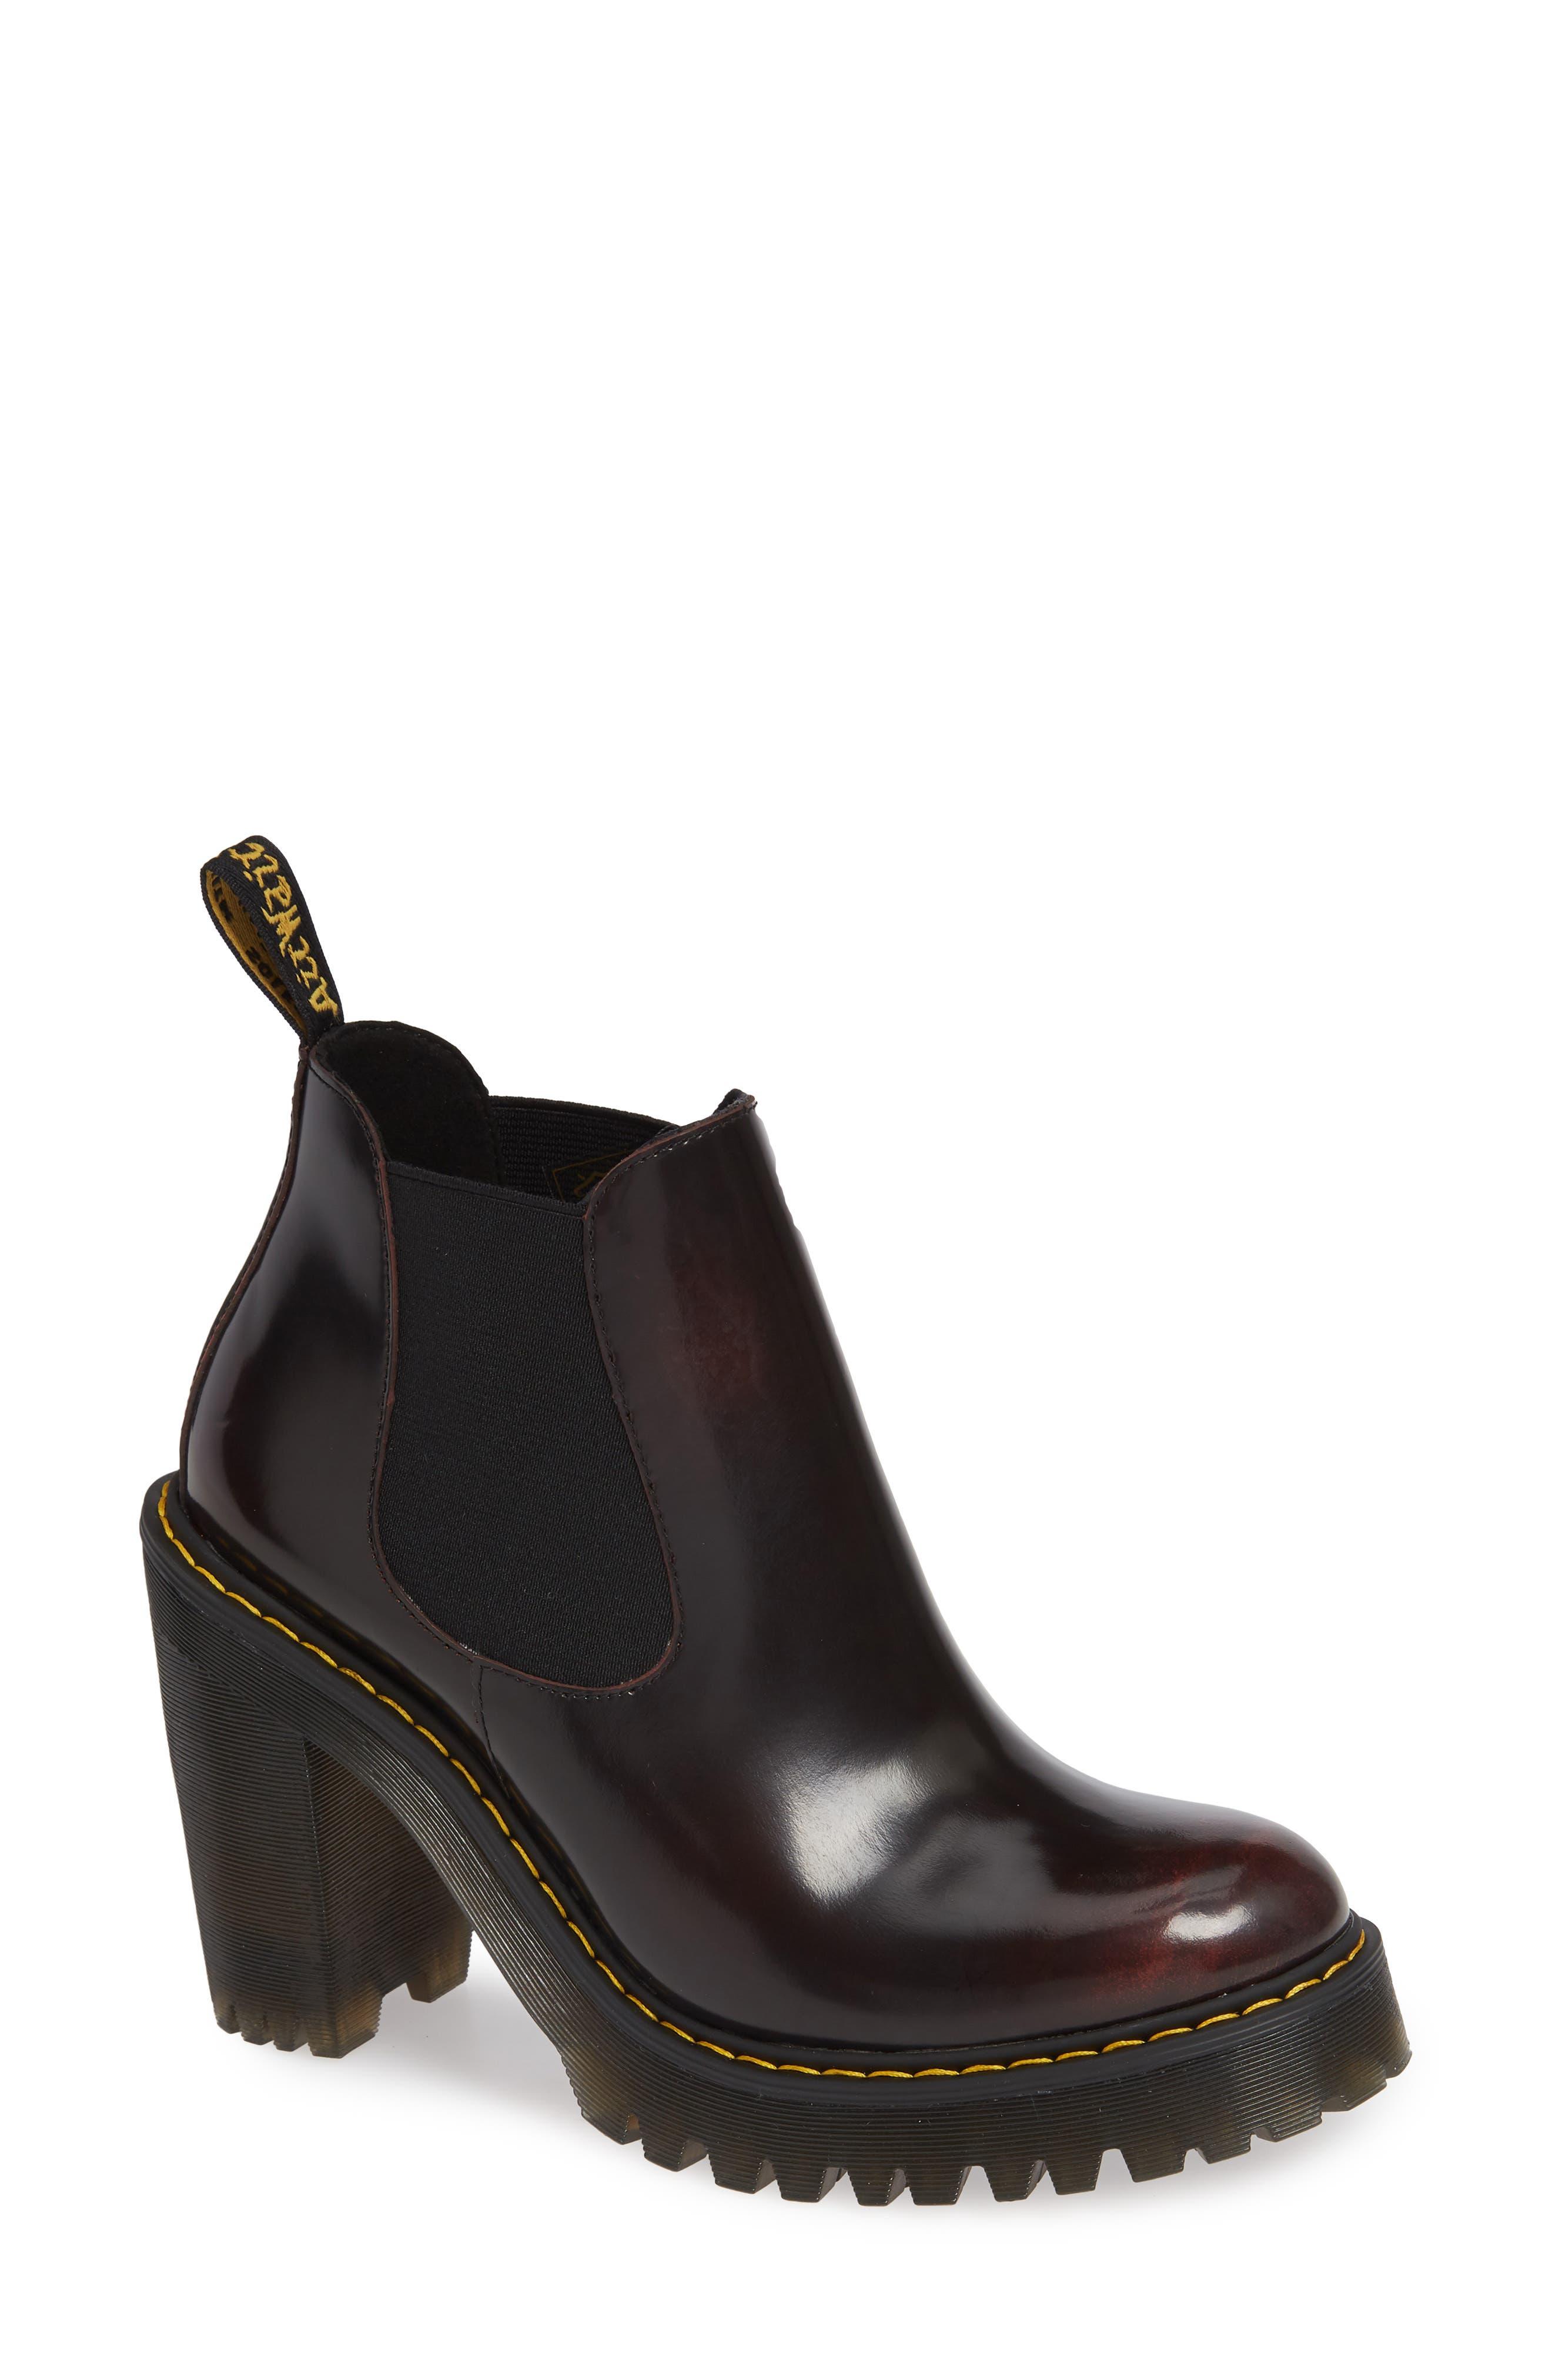 DR. MARTENS Hurston Chelsea Boot, Main, color, 930